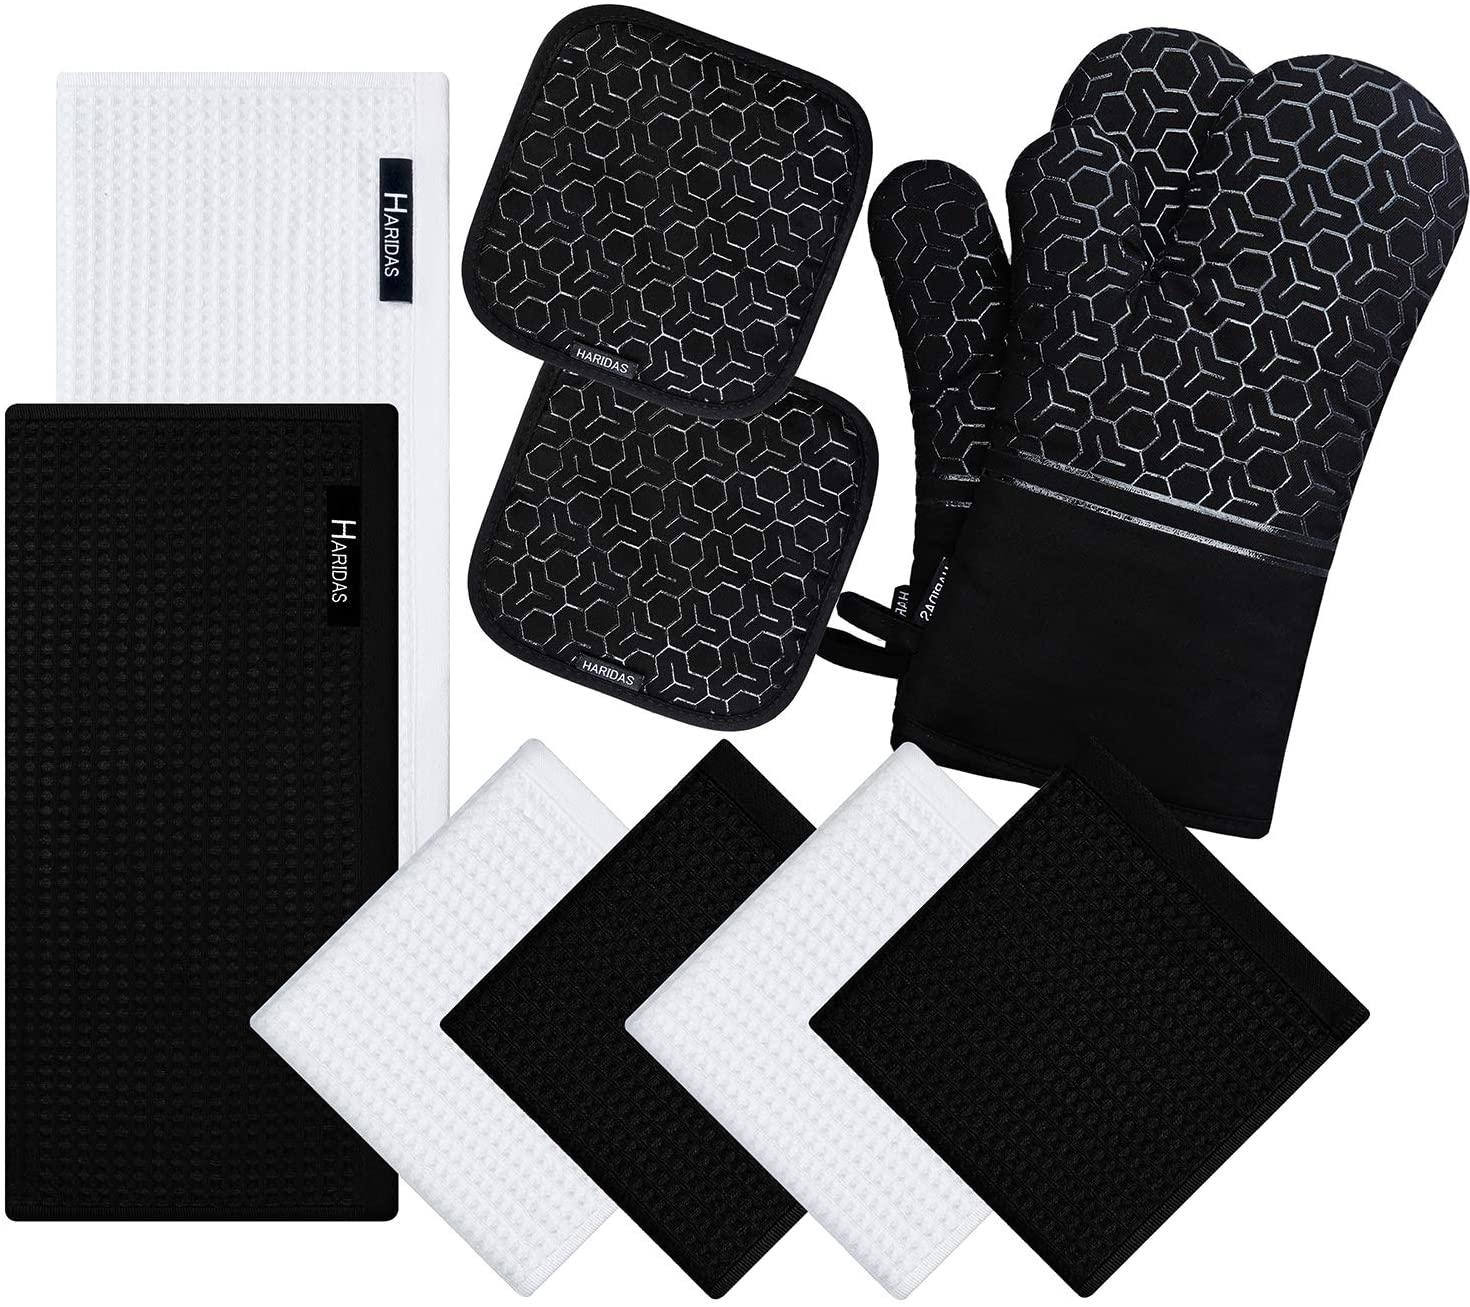 practical-housewarming-gifts-kitchen-linens